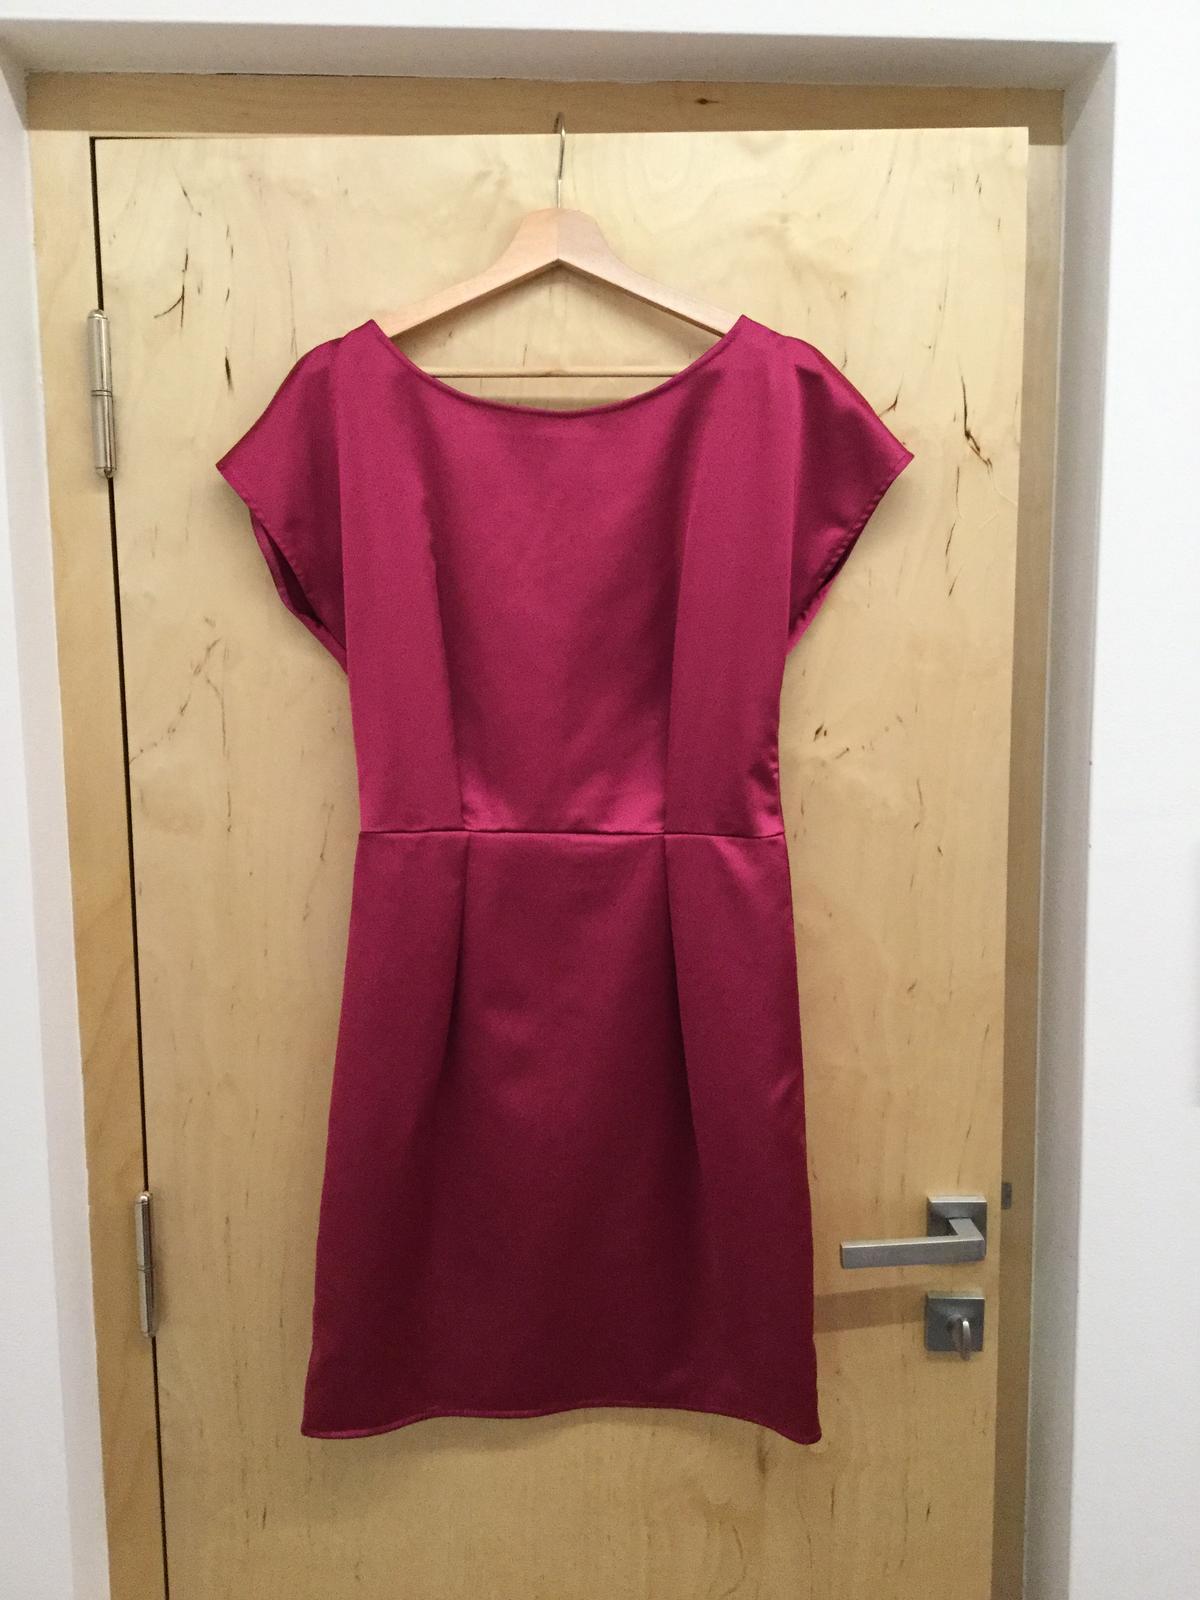 30f4fdd4fca Společenské šaty fuchsiové